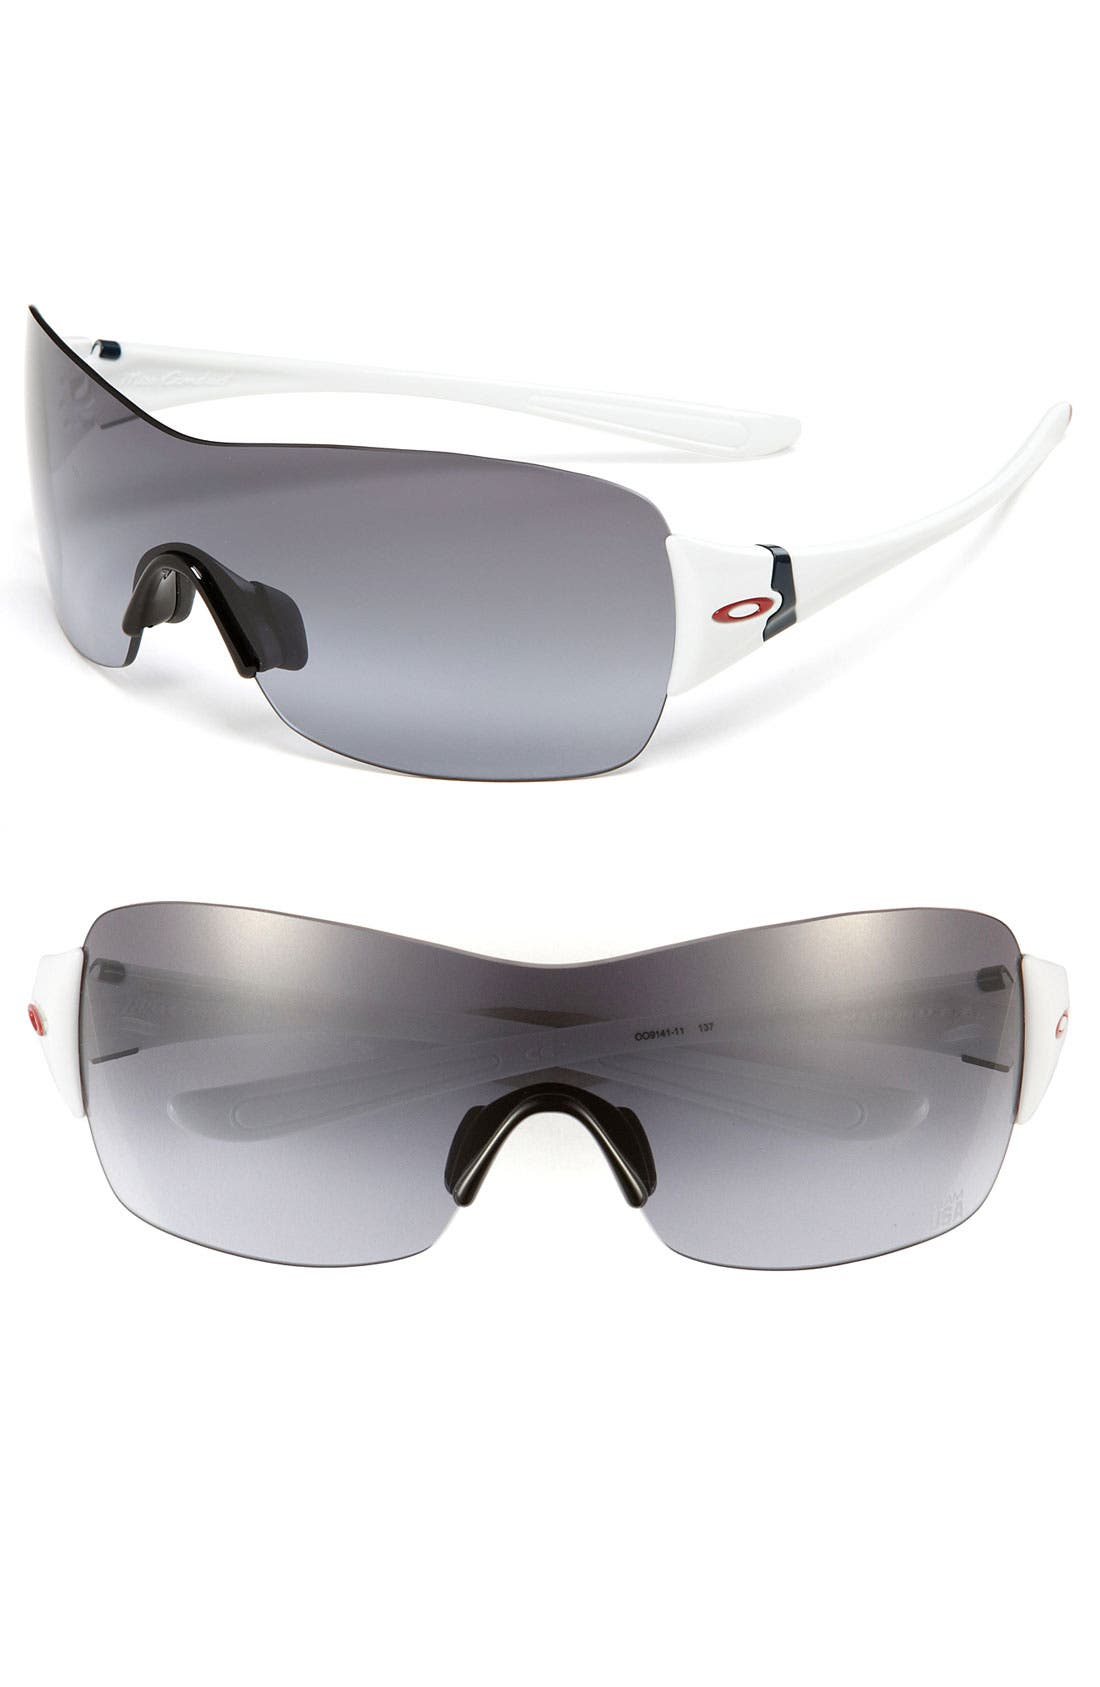 Main Image - Oakley 'Miss Conduct™ - Team USA' 137mm Rimless Shield Sunglasses